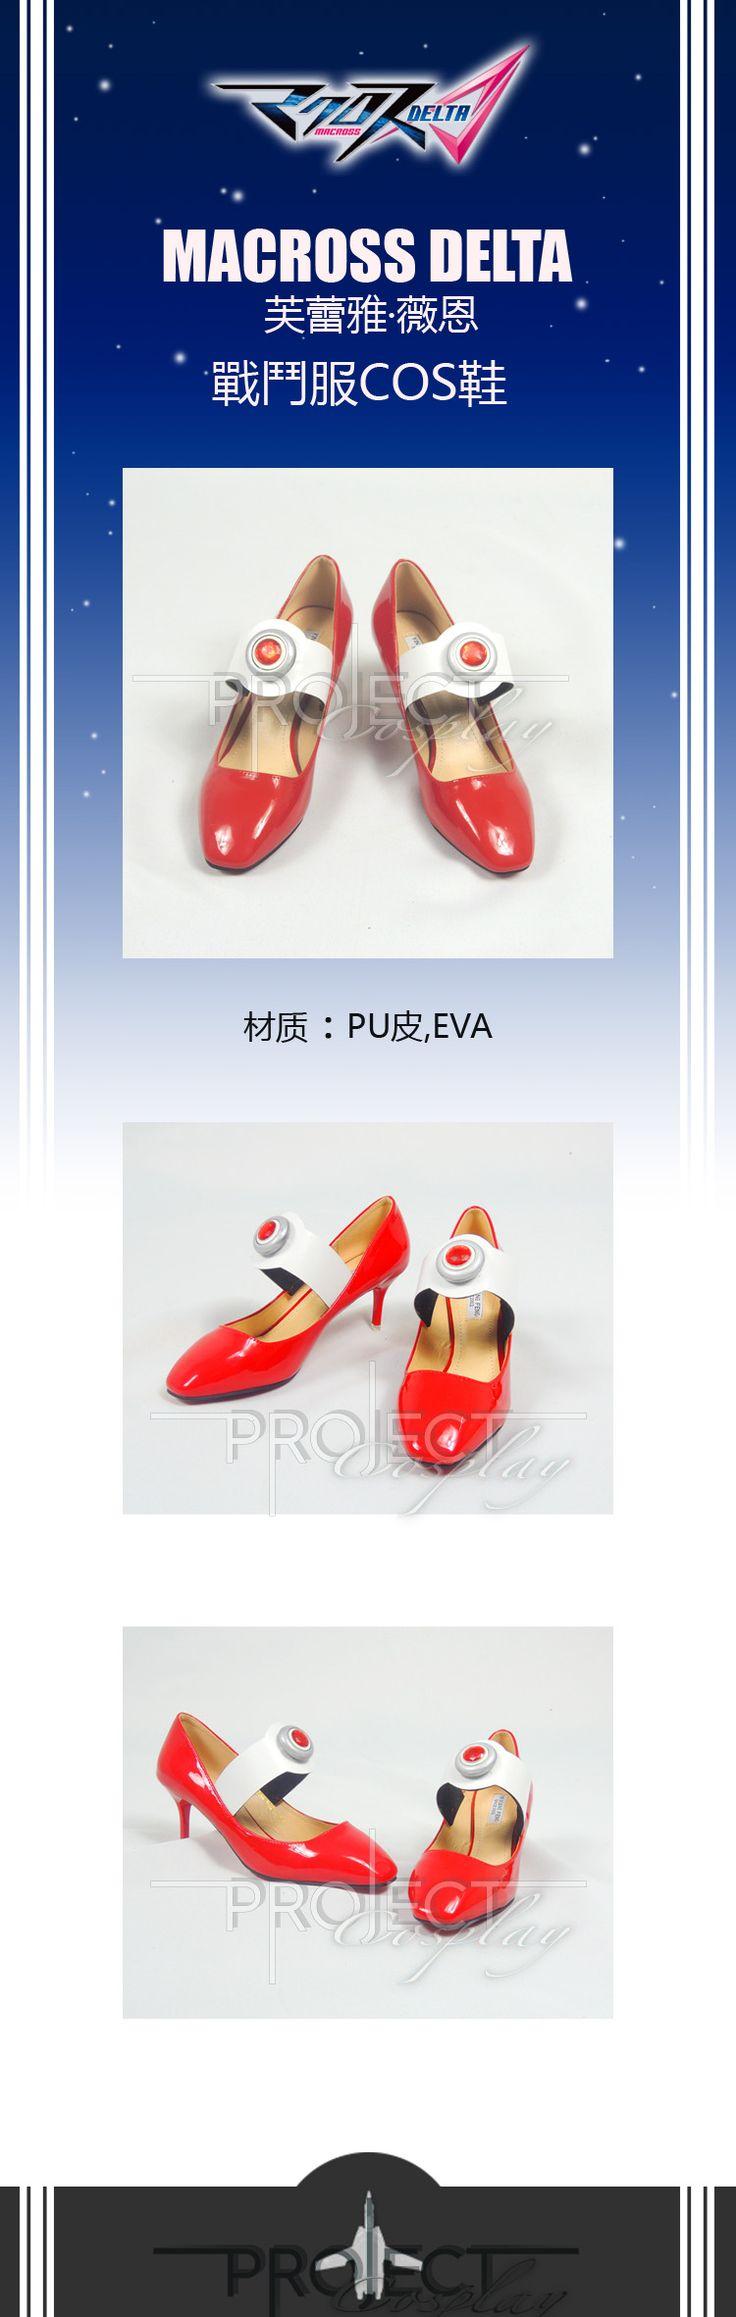 Macross Delta Freya · Wei En shoes boots cosplay- Taobao global Station